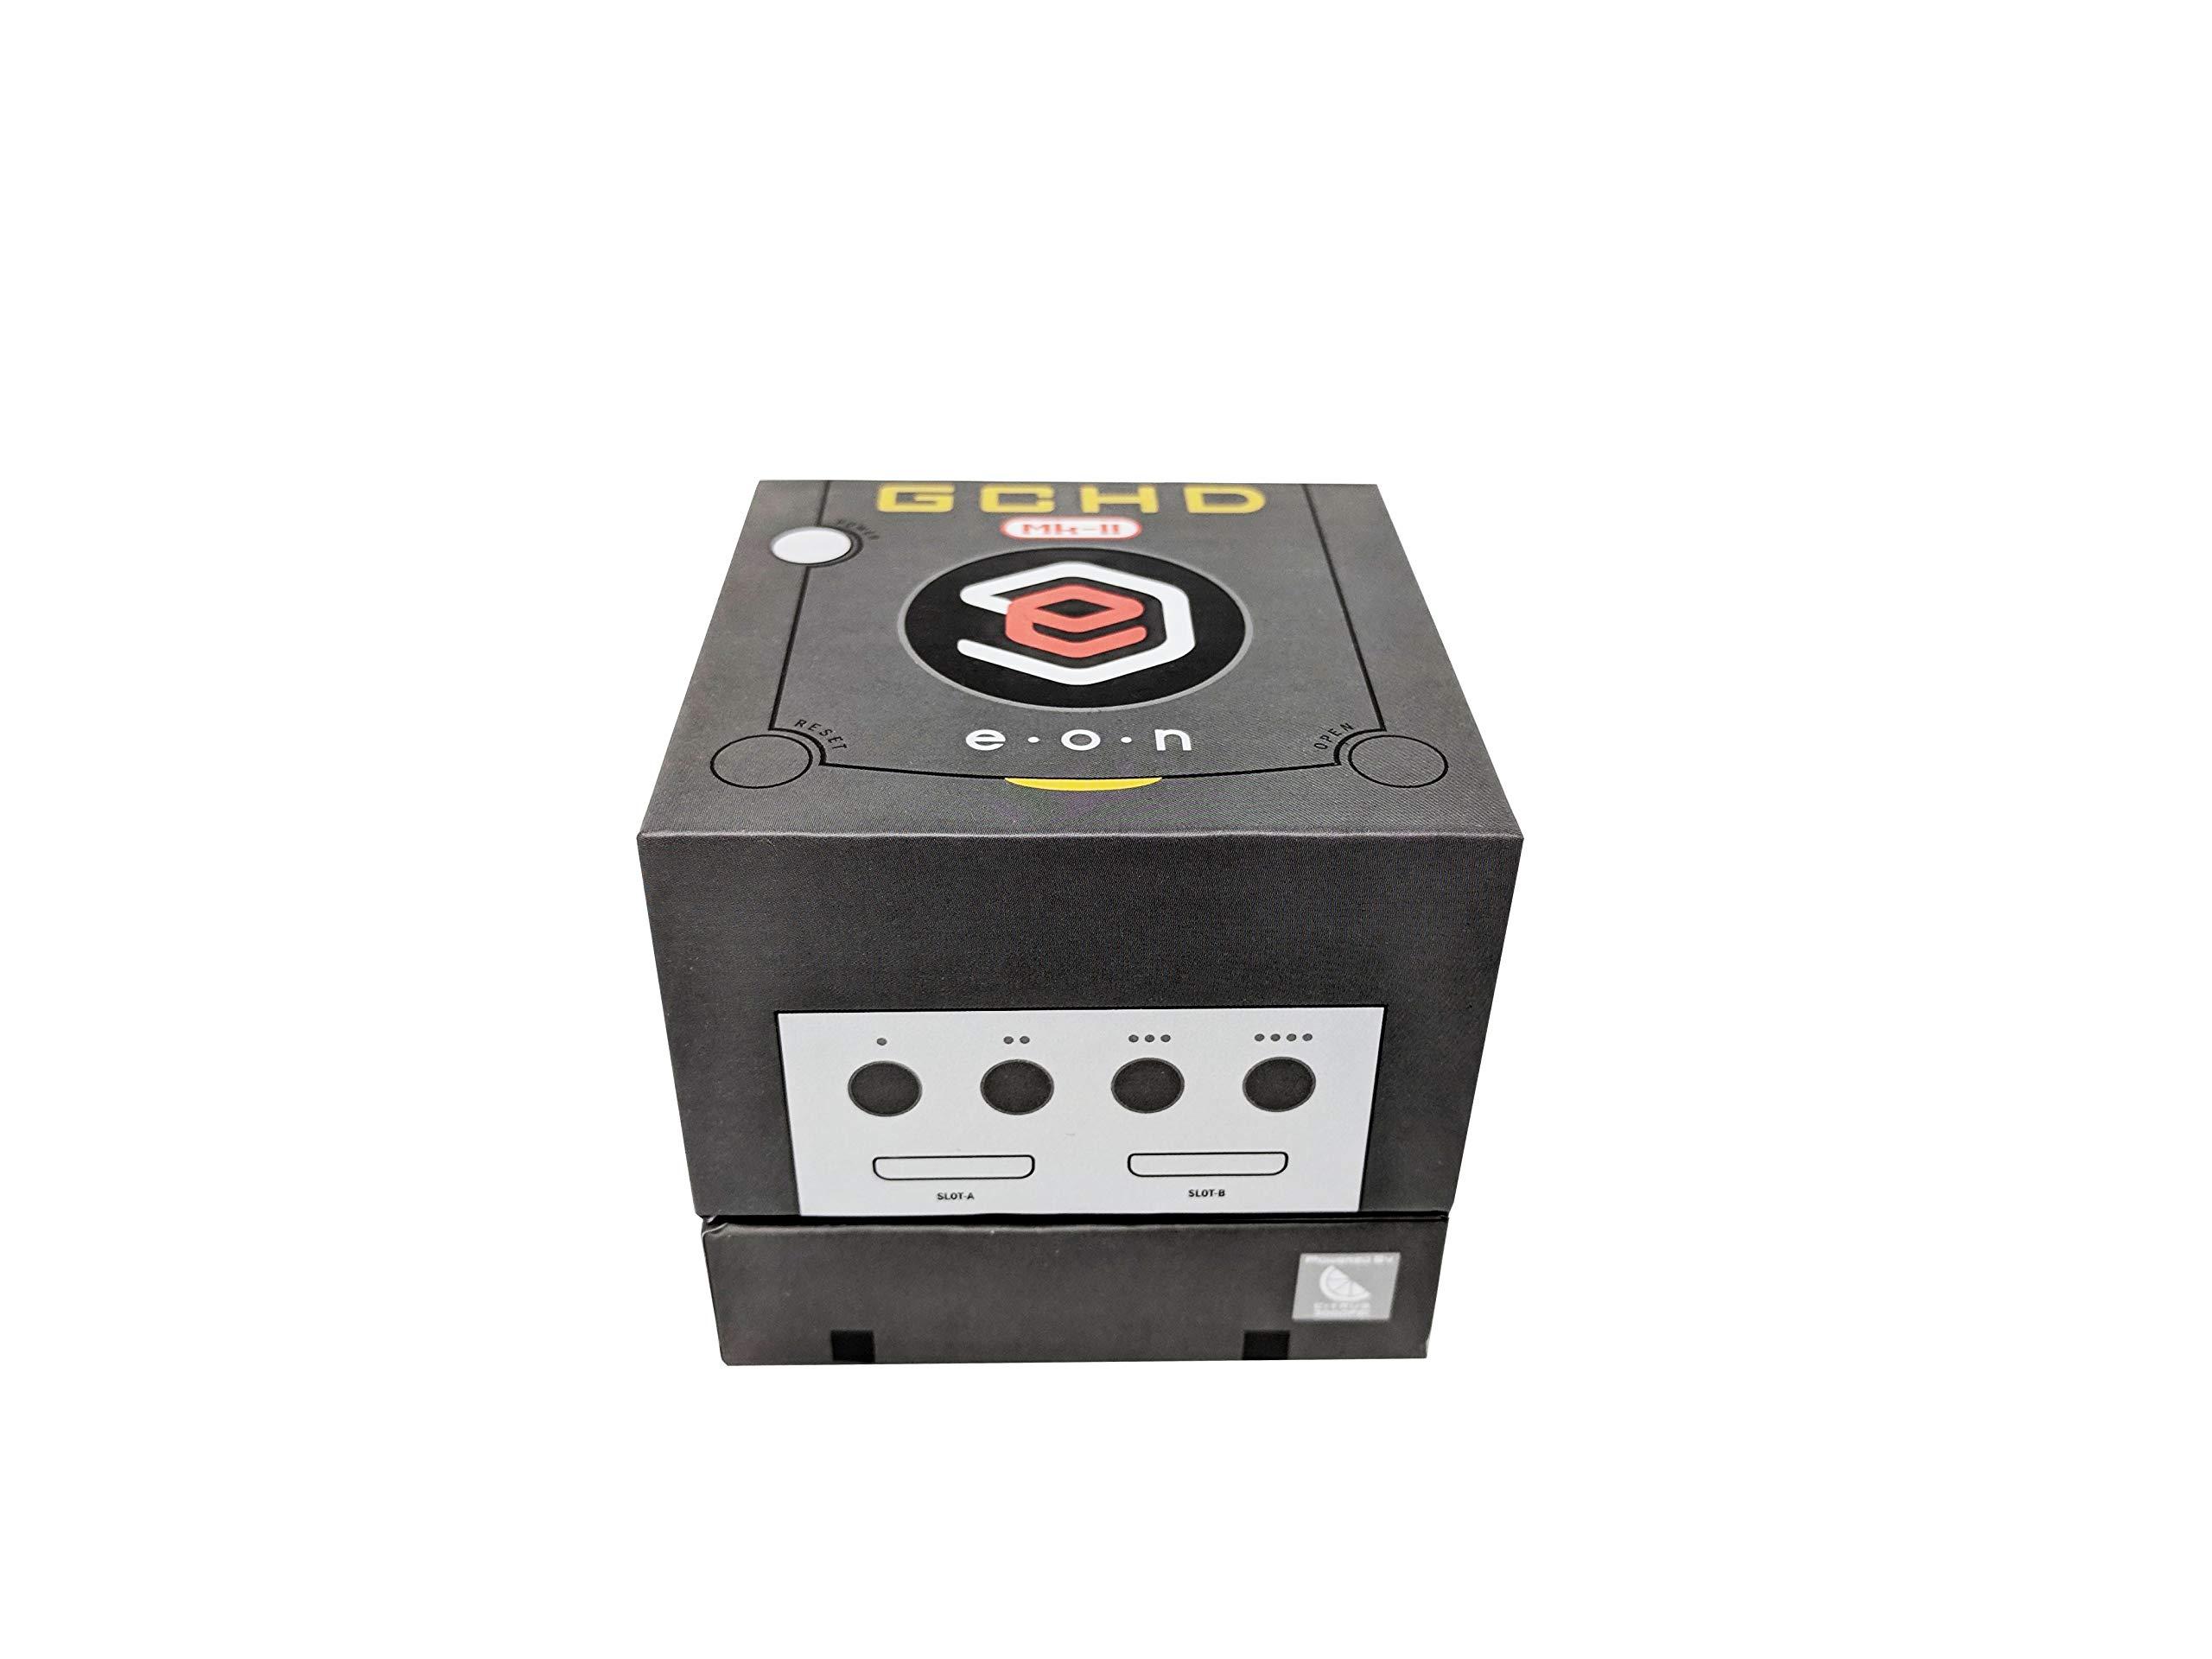 GCHD Mk-II | GameCube HDMI Adapter (RGBlack) by Eon (Image #3)